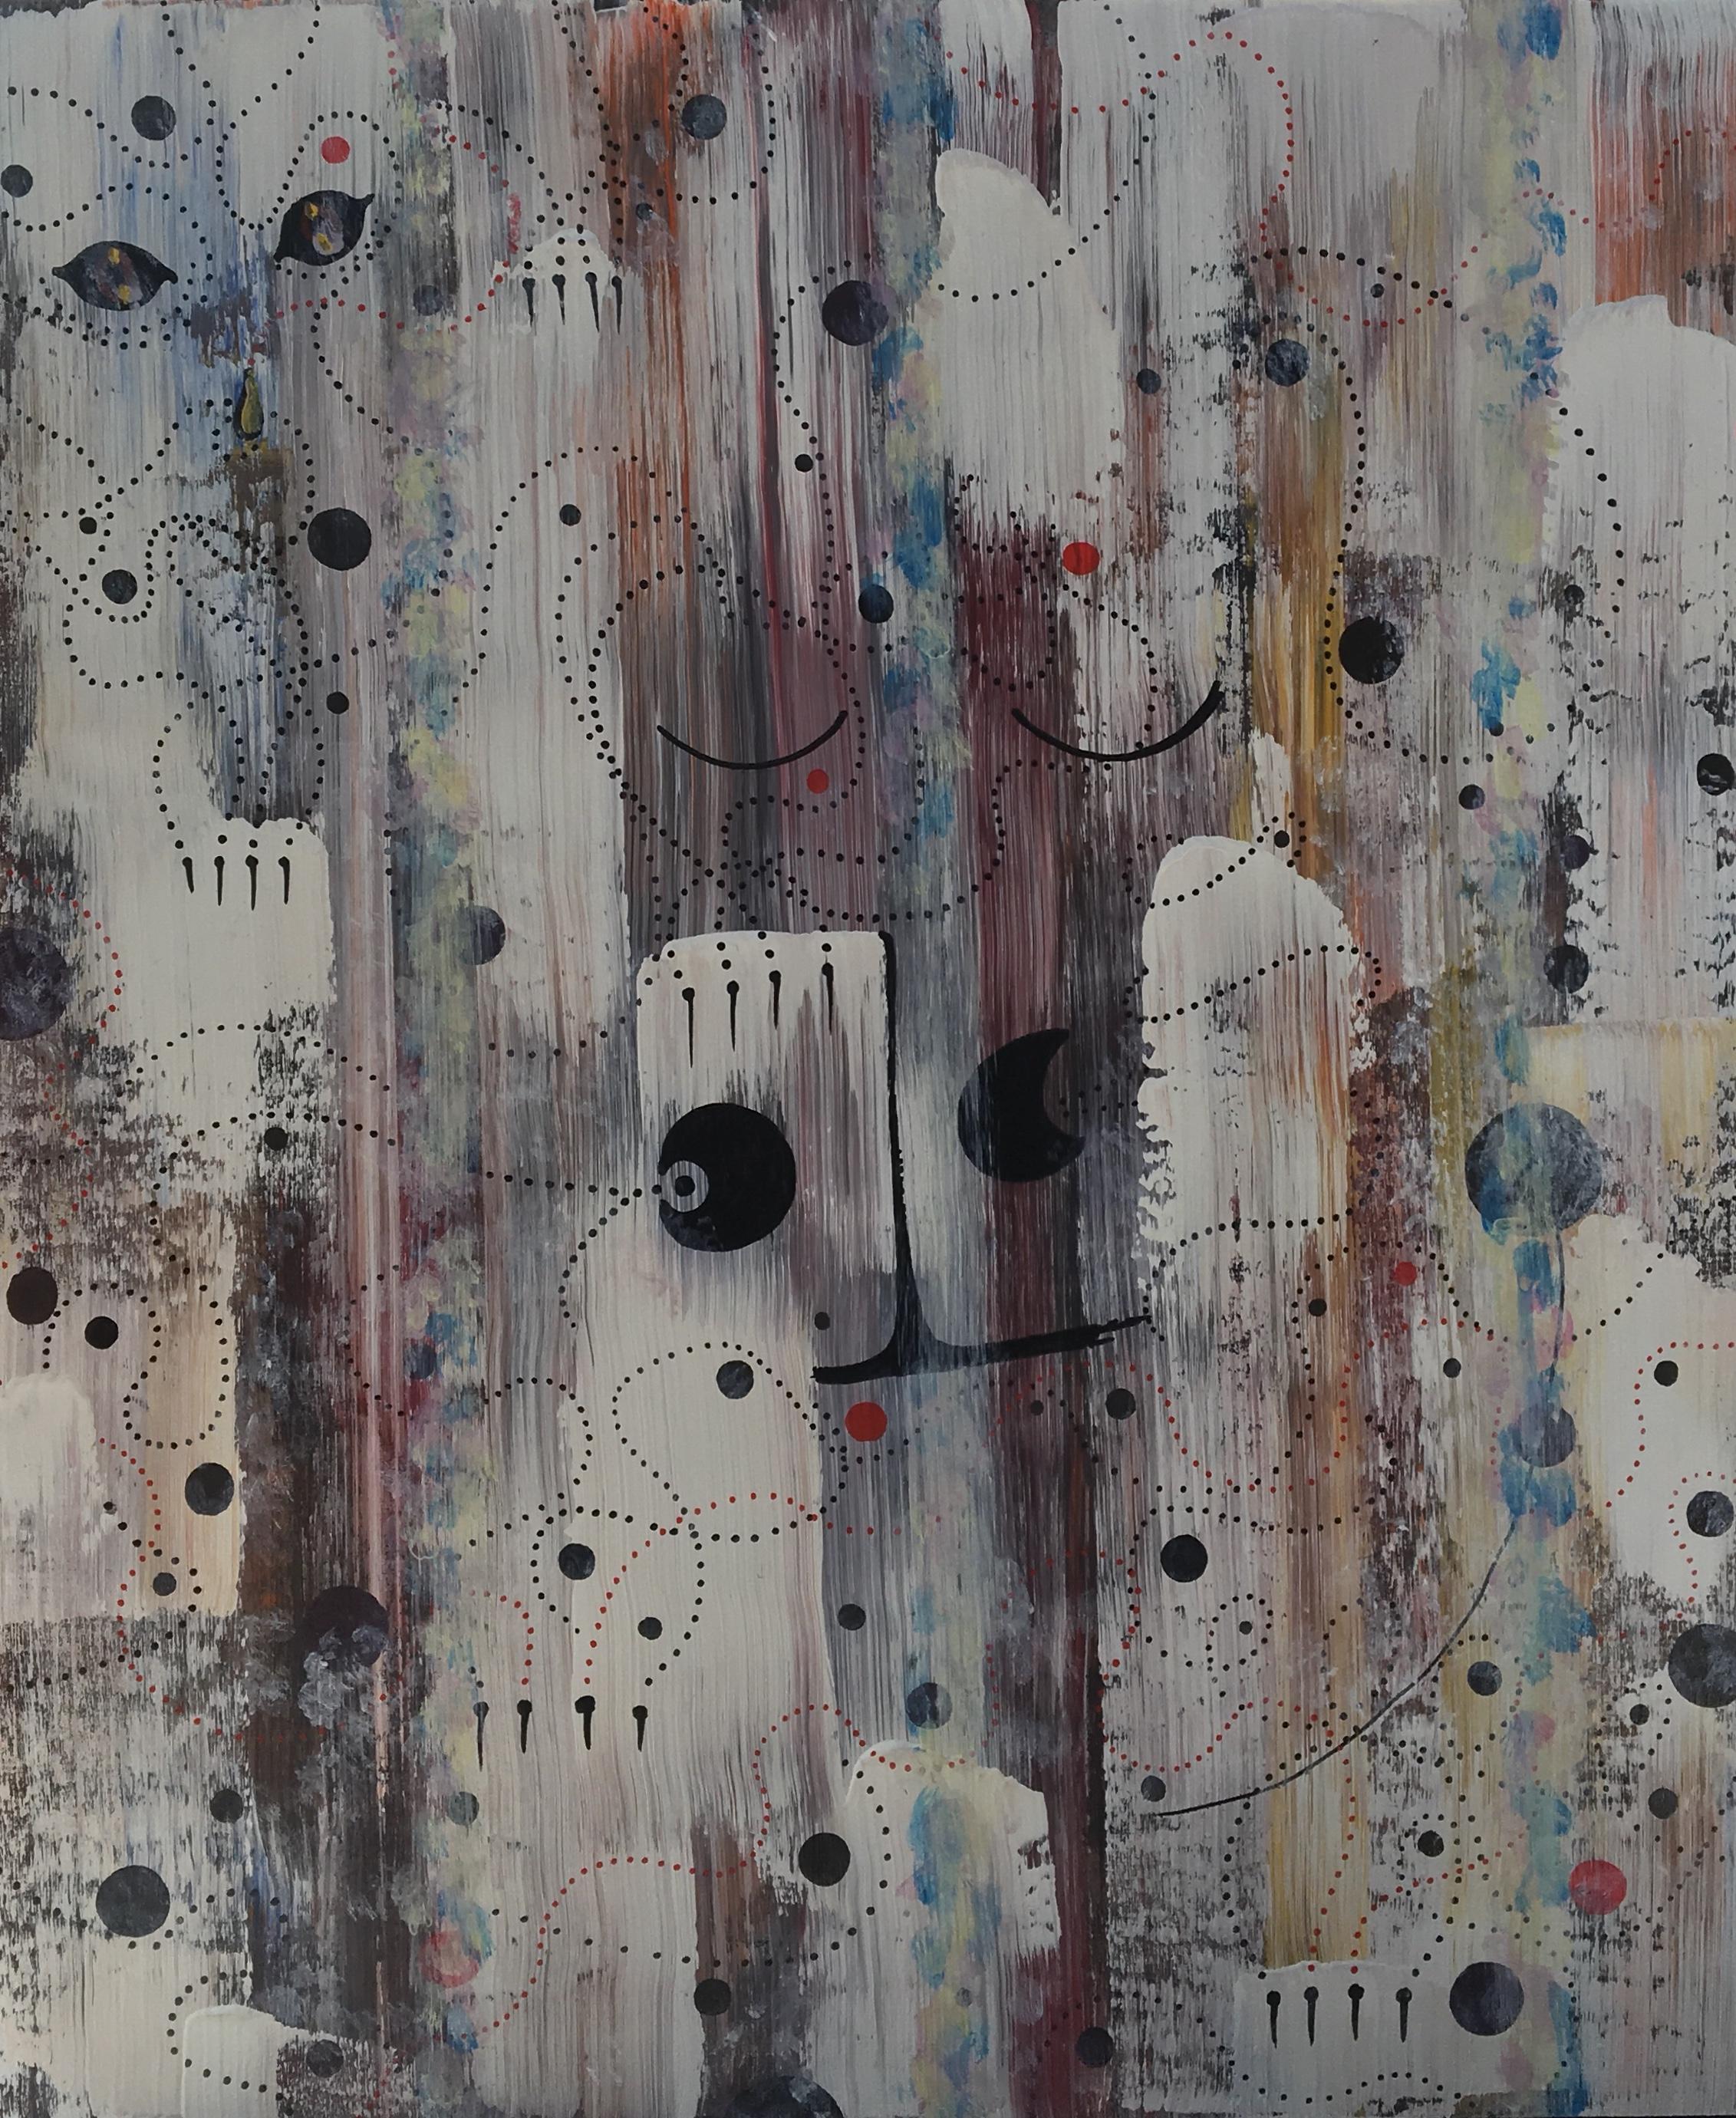 Raining Cats & Dogs  2019 - 24 X 20 Acrylic on Panel